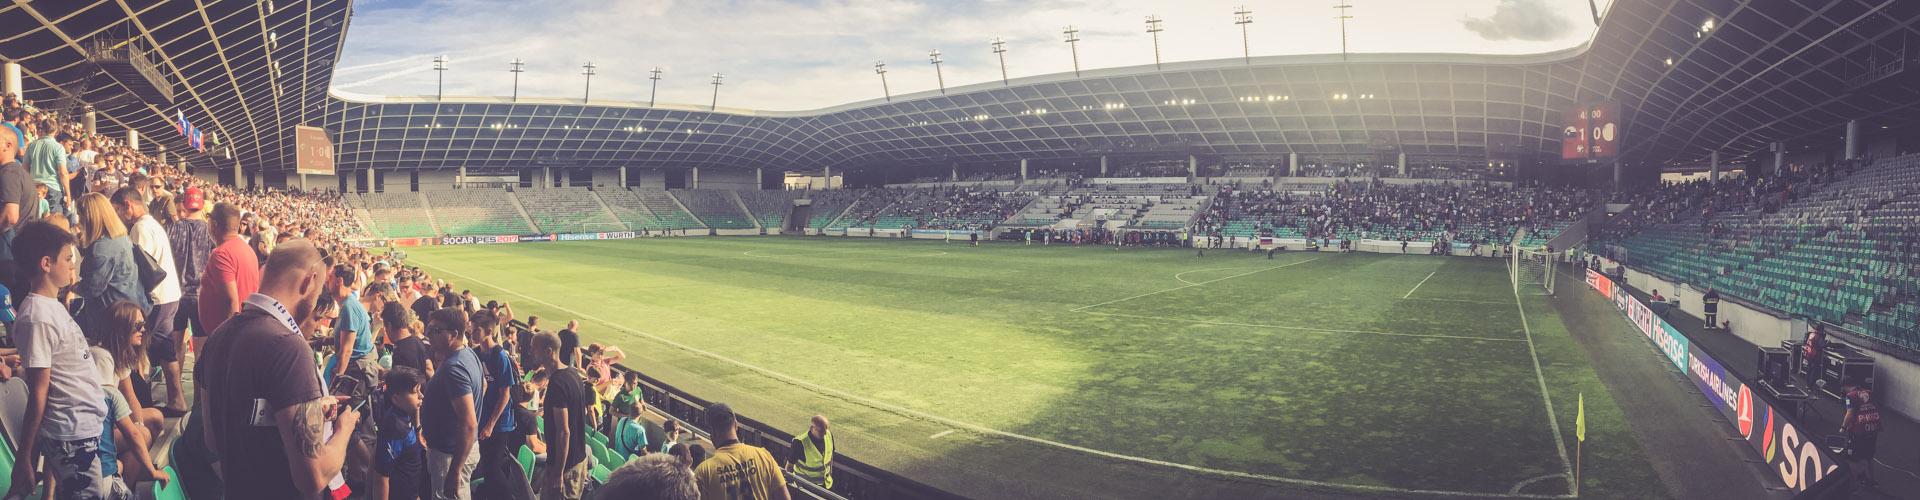 Stozice Stadium, Ljubljana